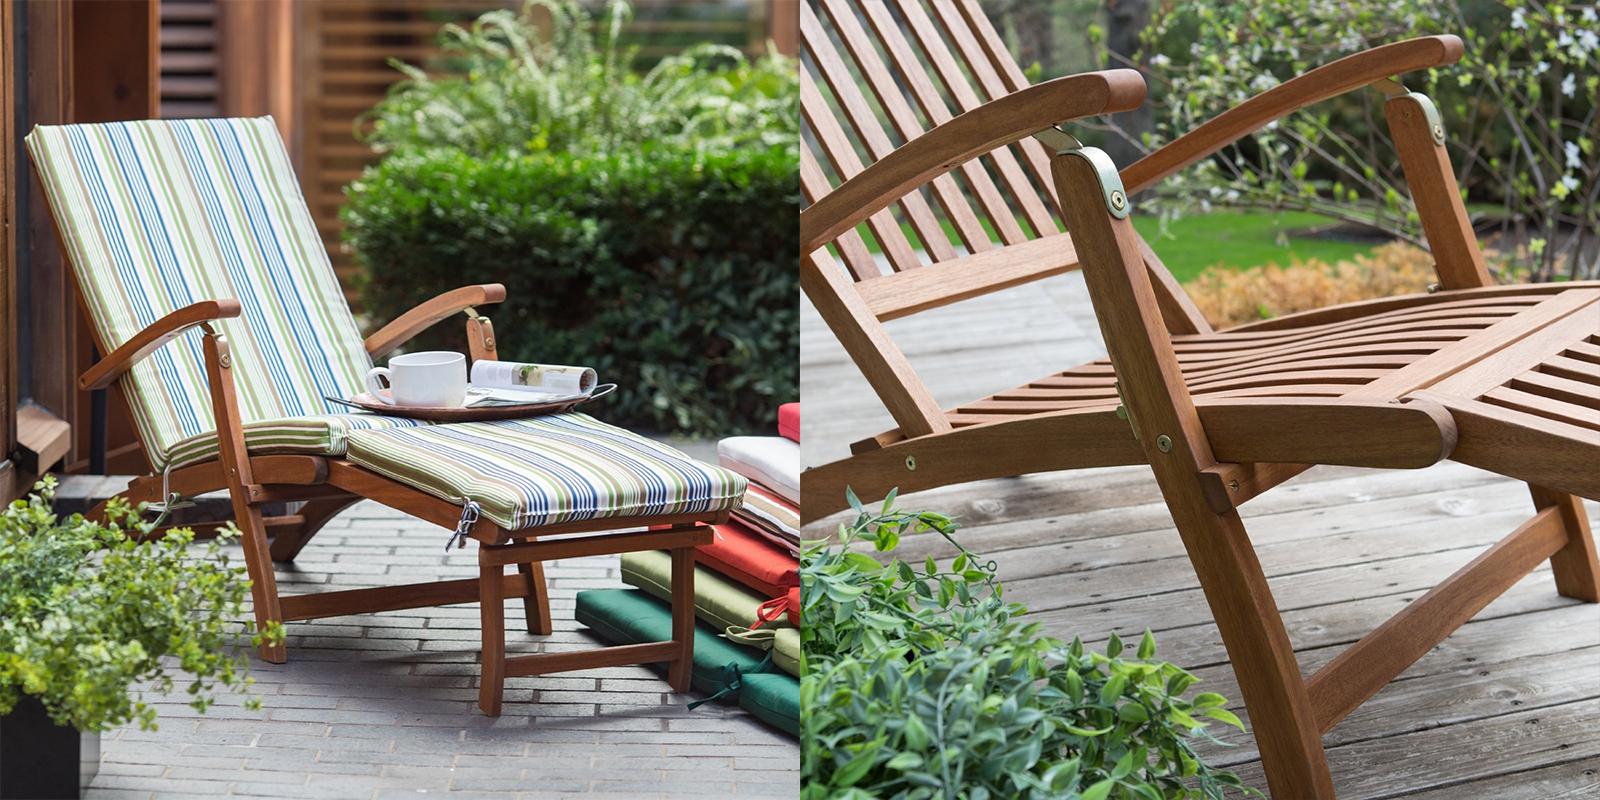 Patio Chair - Deck Lounge Chair